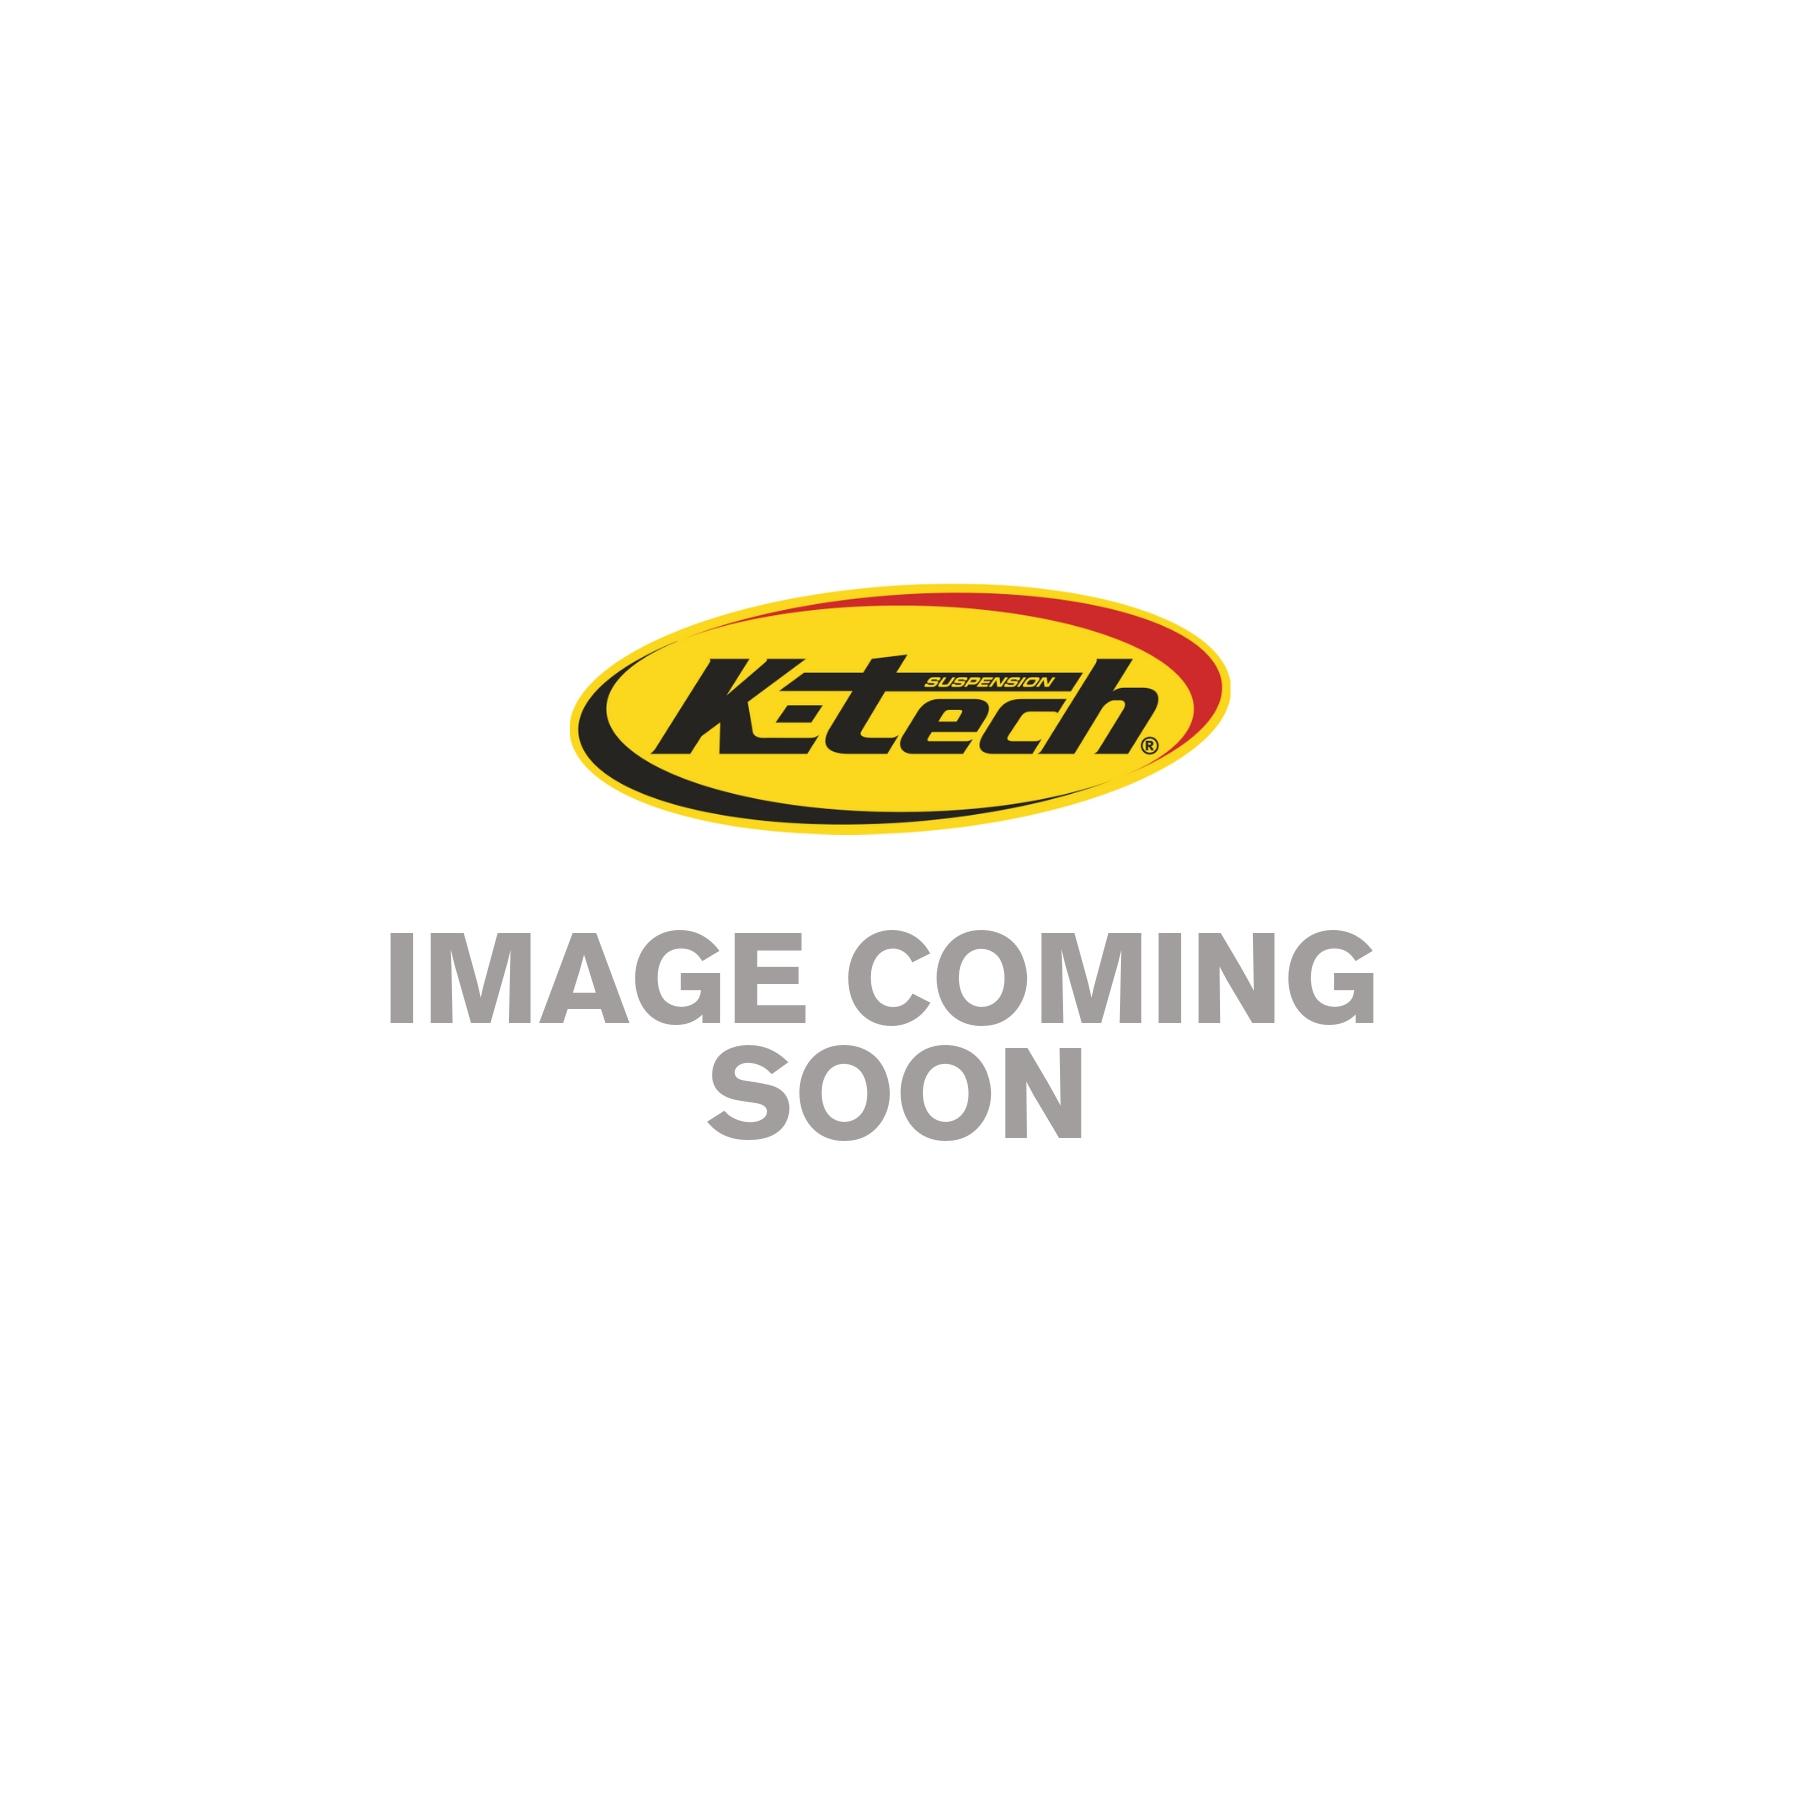 RDS Front Fork Cartridges Honda CBR6000RR 2005-2006 Showa